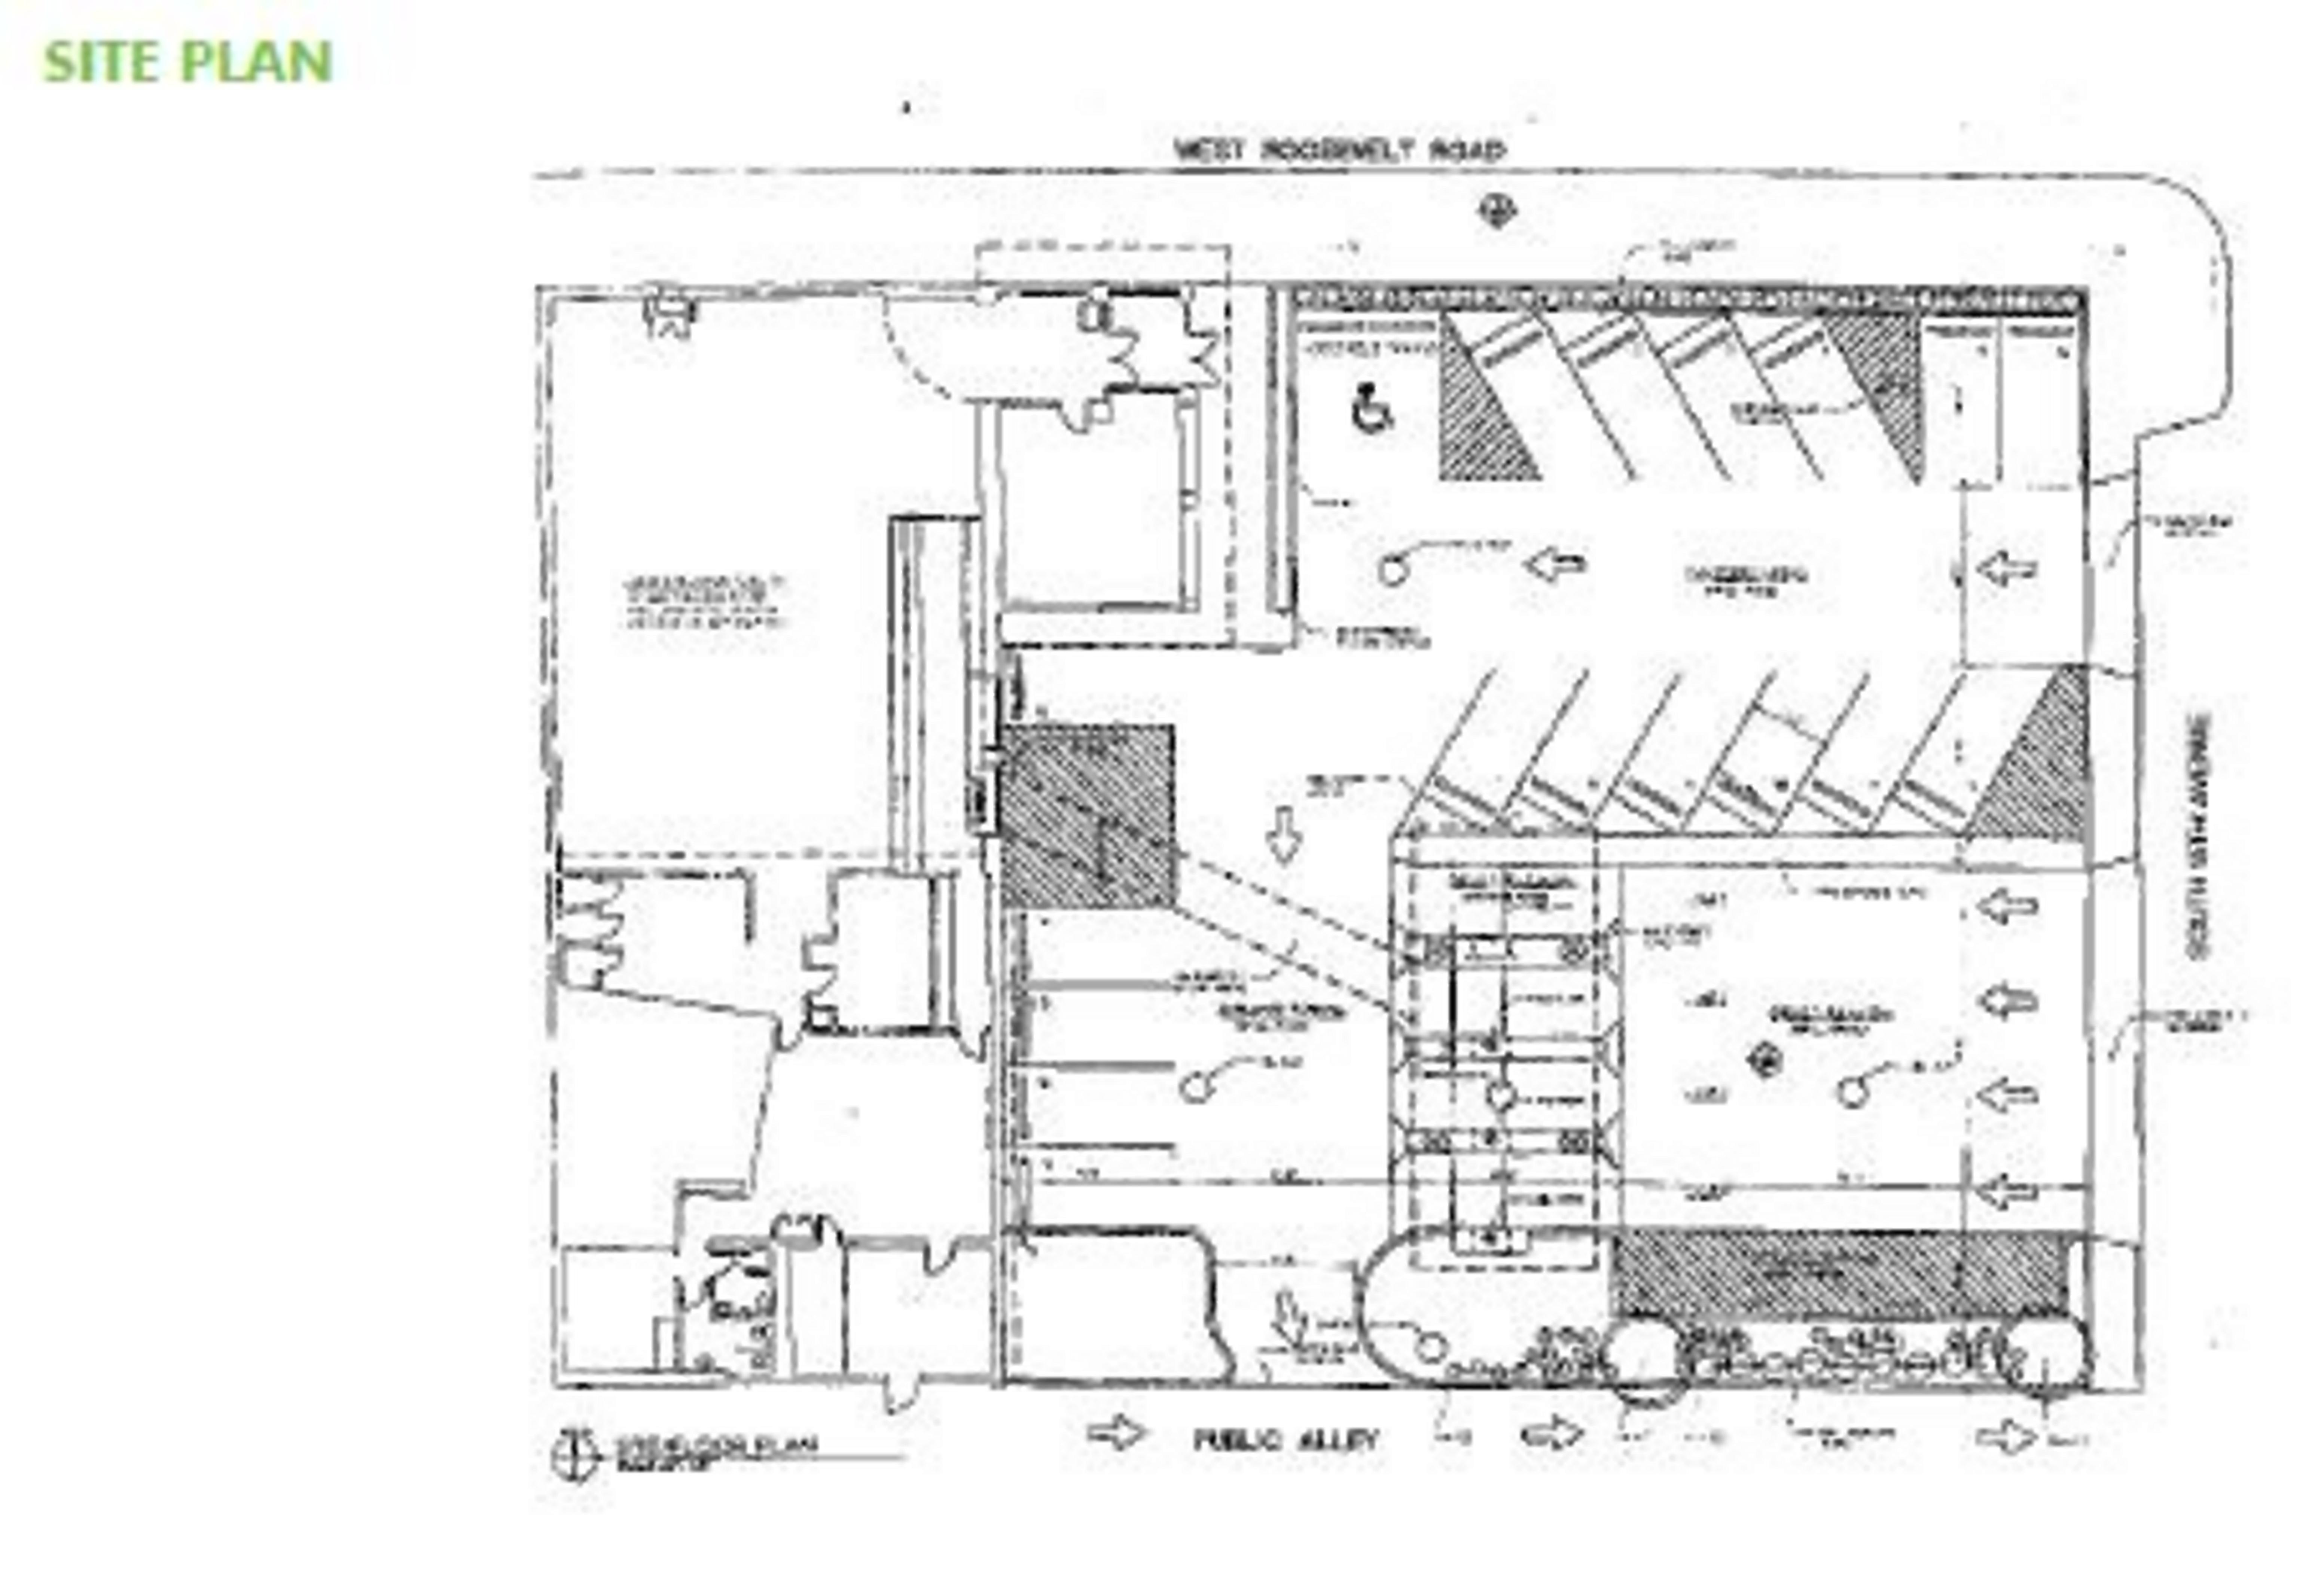 1500 Roosevelt Rd.: site plan